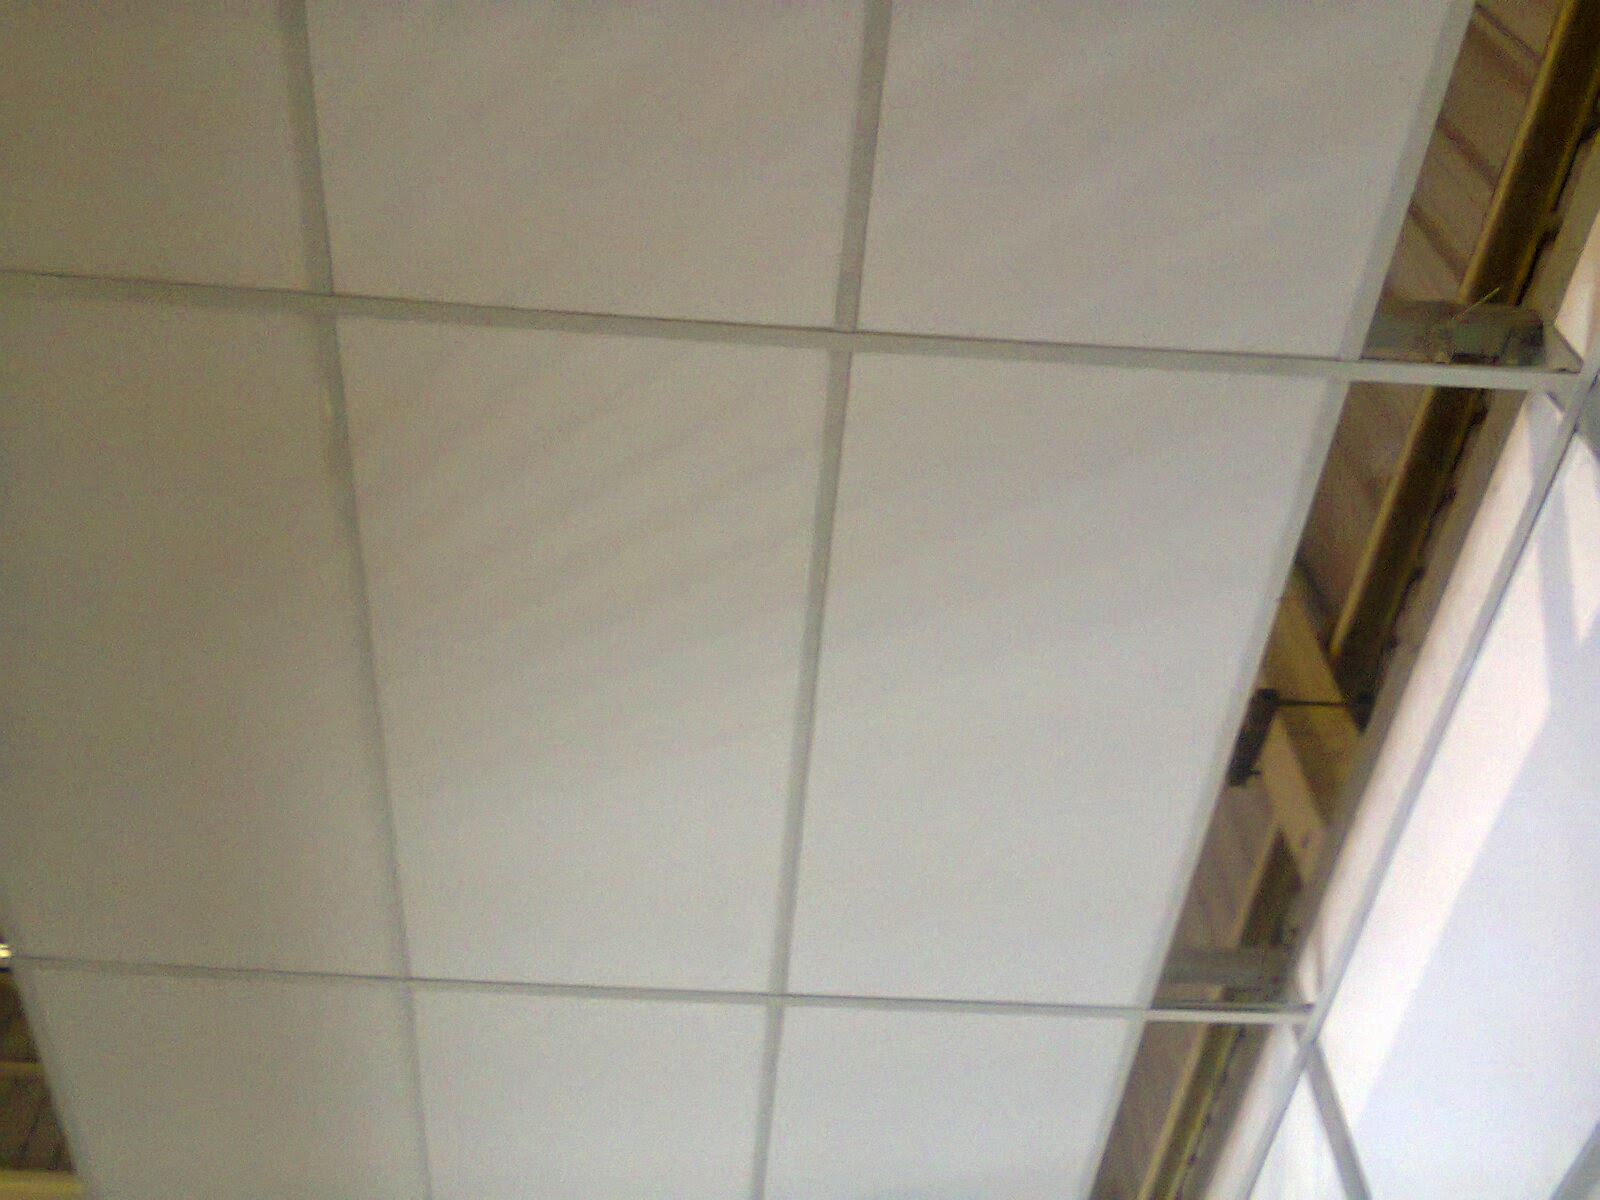 Harga Kanopi Baja Ringan Karawang Abadi Jaya Steel: Plafon Gypsum Murah Di ...